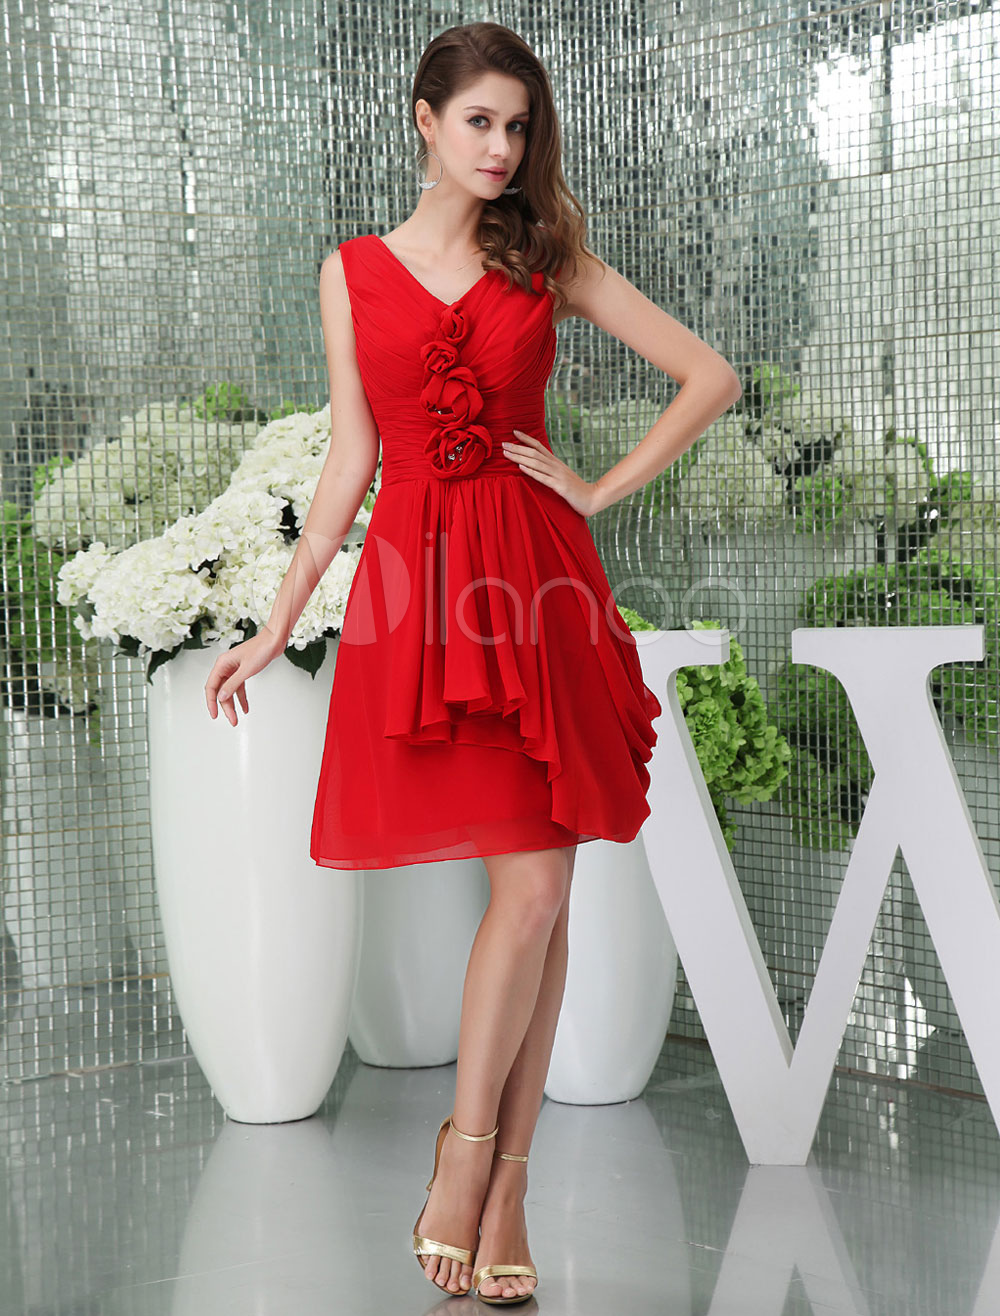 Chiffon Homecoming Dress Pleats Beading Plunging Cocktail Dress A-Line Short Prom Dress Milanoo